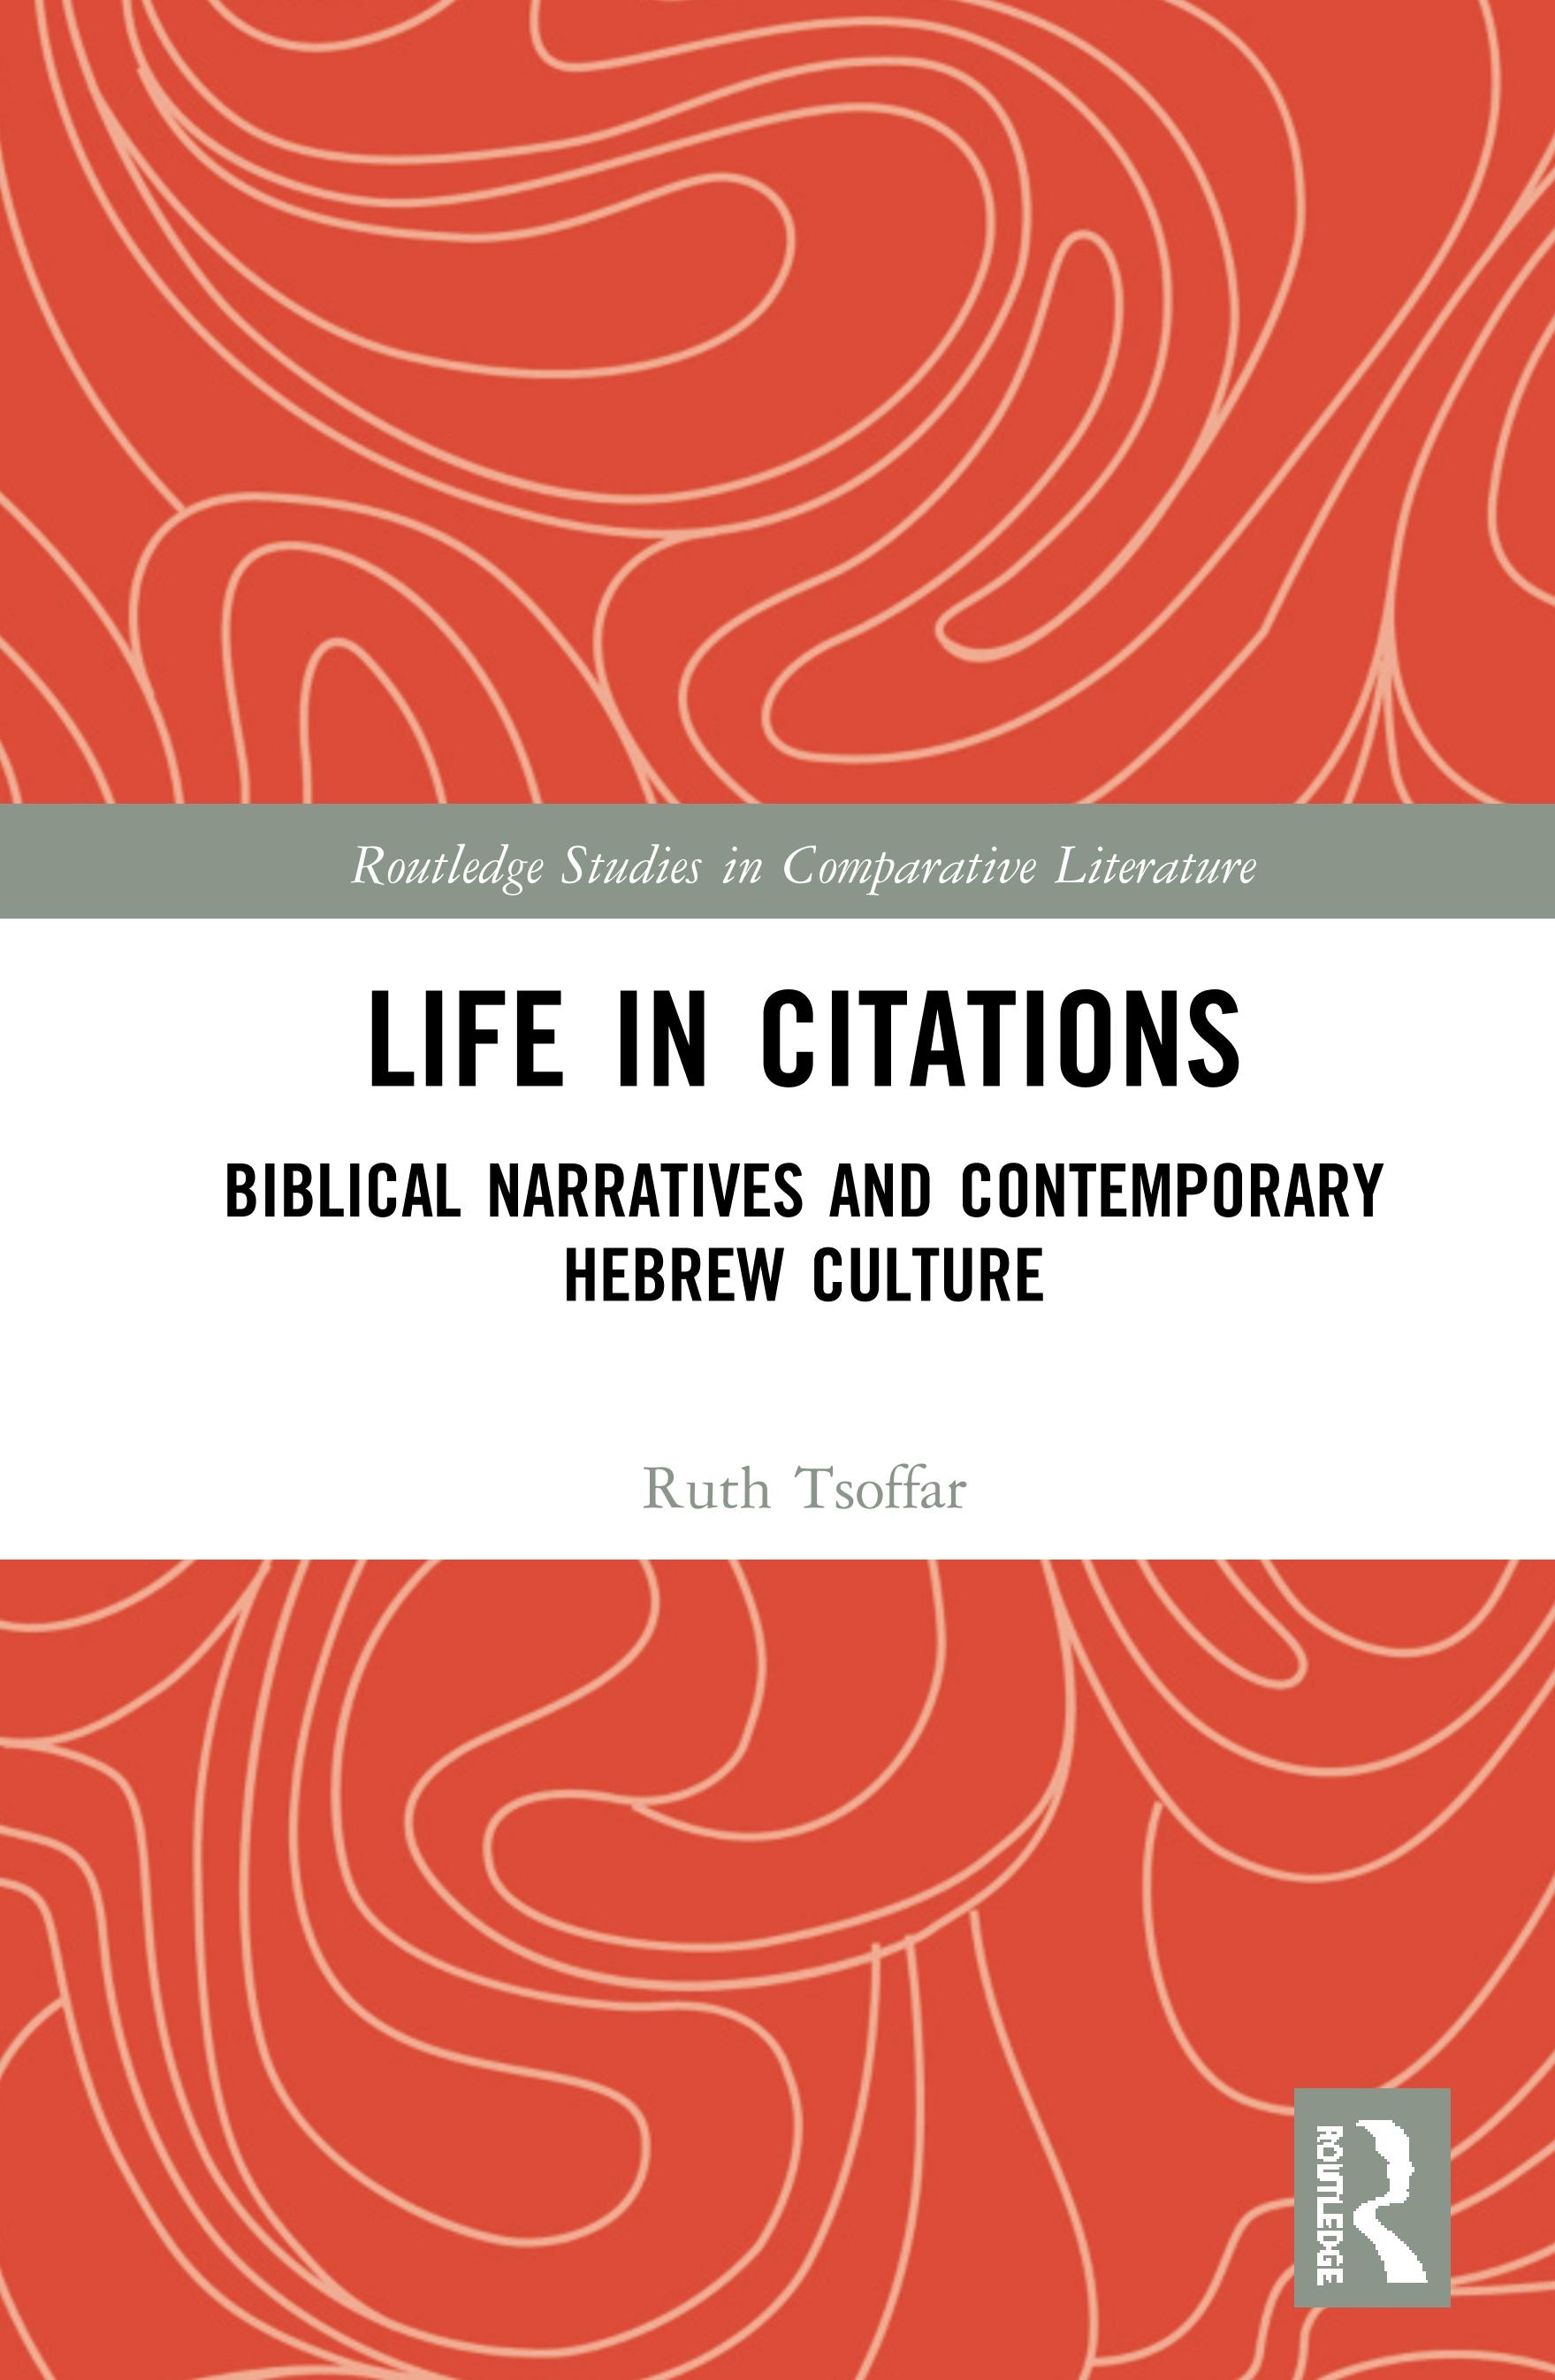 Life in Citations: Biblical Narratives and Contemporary Hebrew Culture book cover